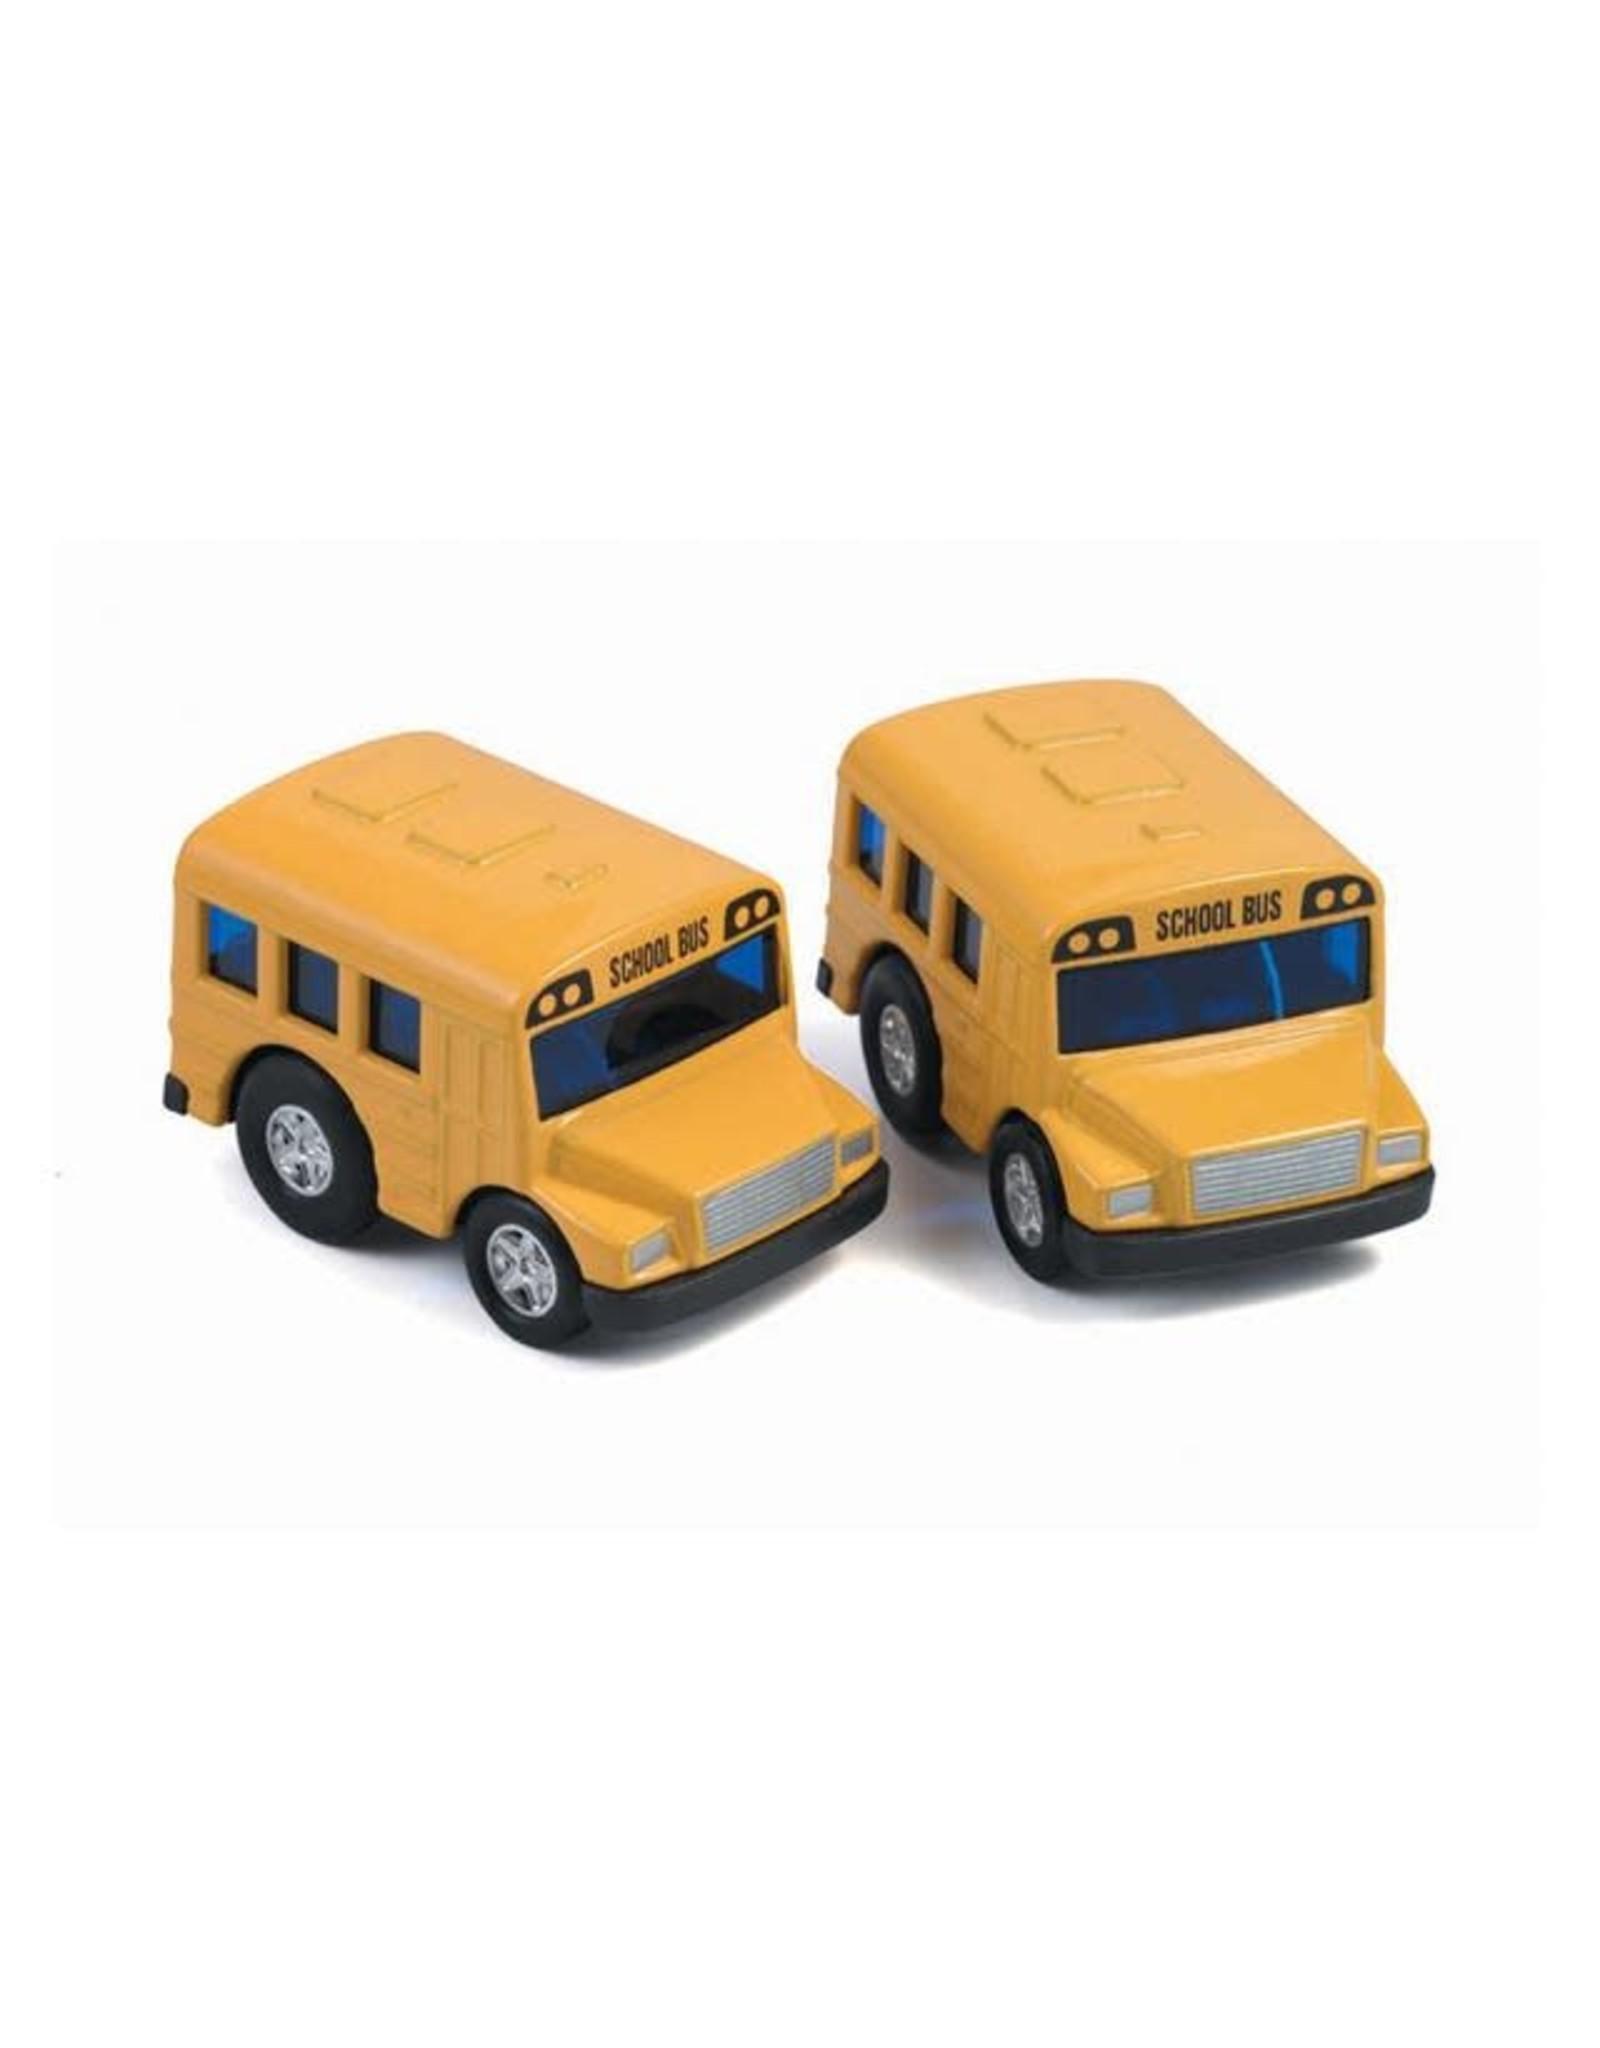 Playwell Pull Back Mini School Bus